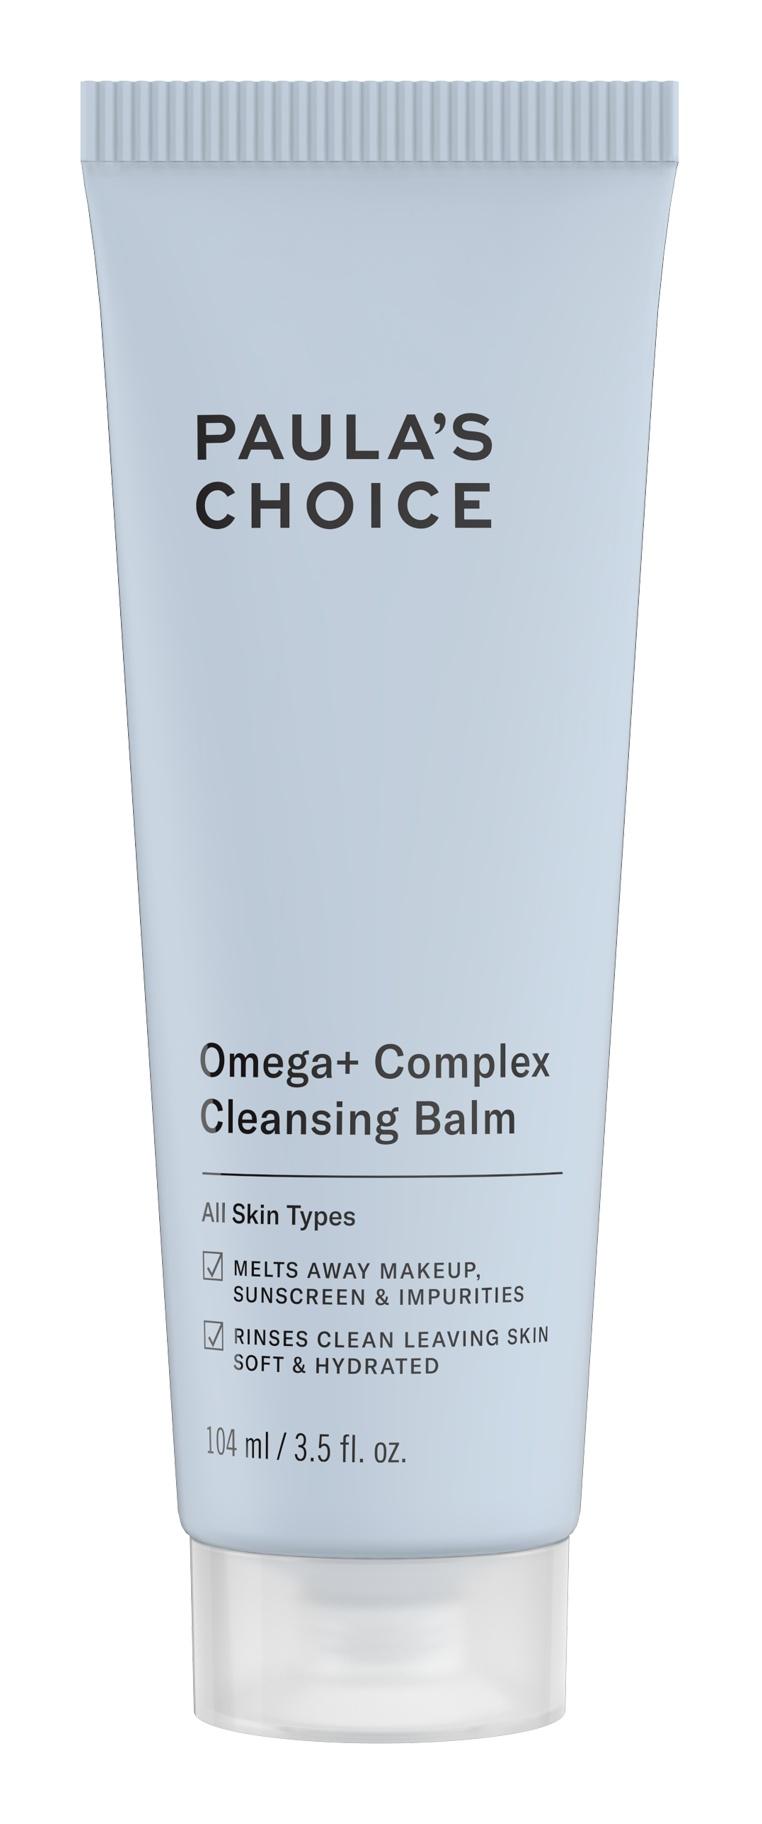 Paula's Choice Omega+ Complex Cleansing Balm